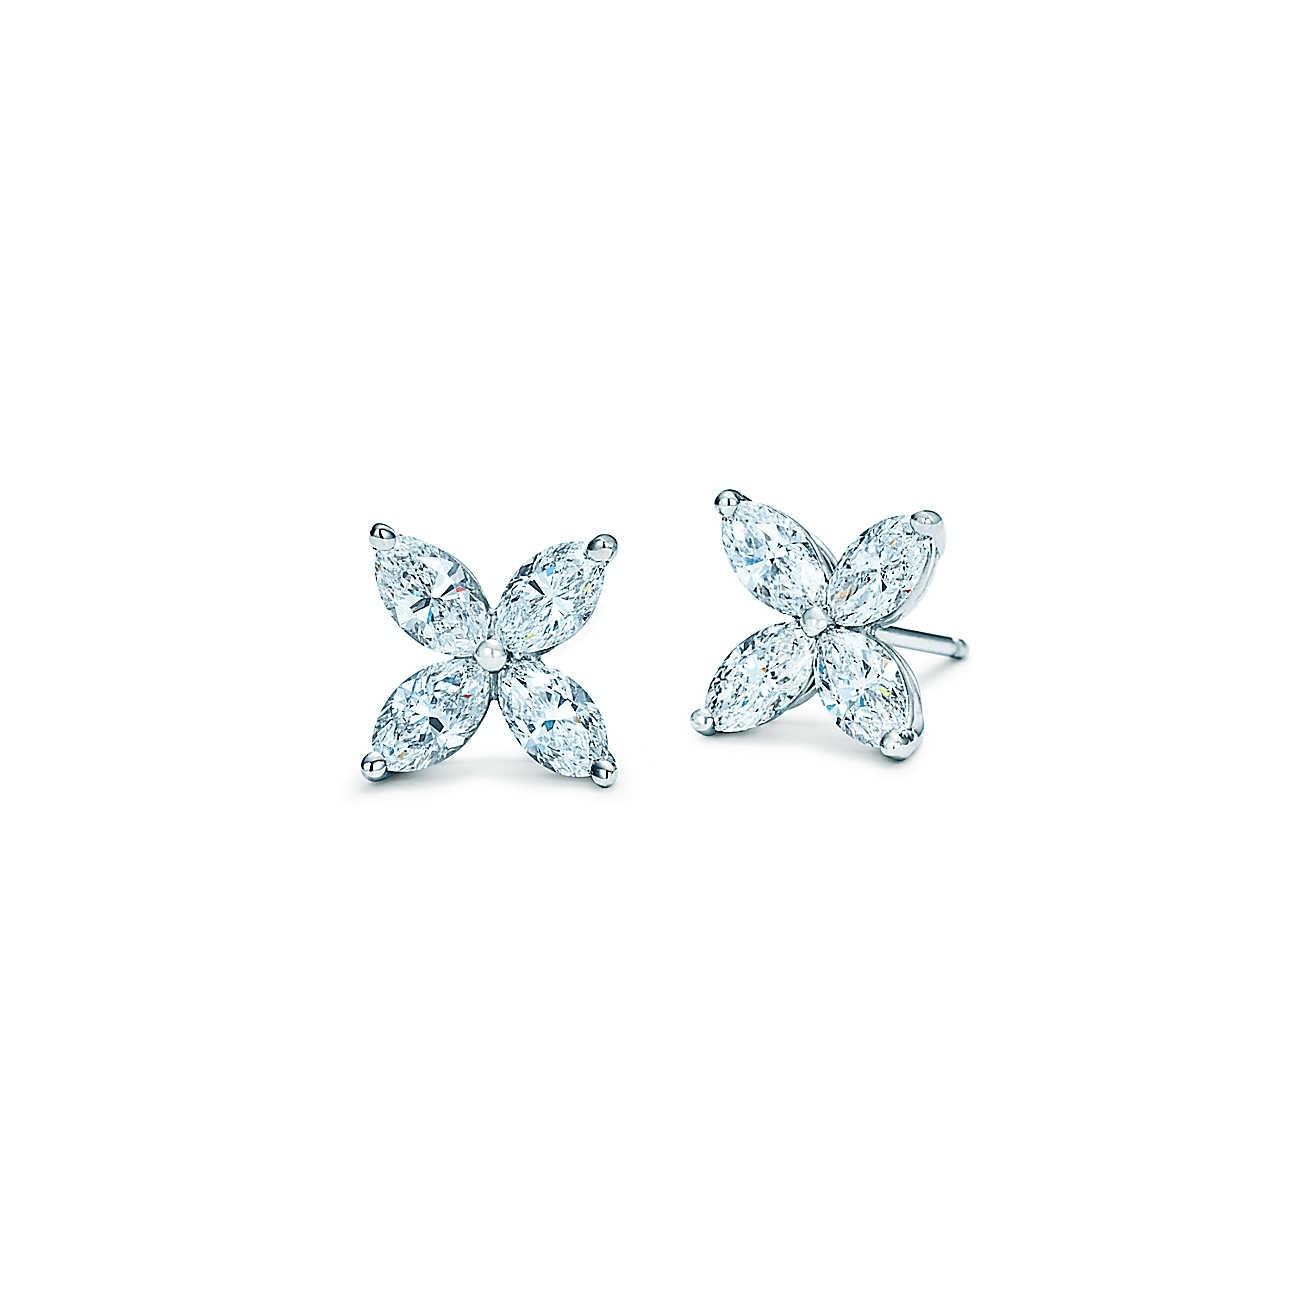 14K White Gold Marquise Diamond Stud Earrings